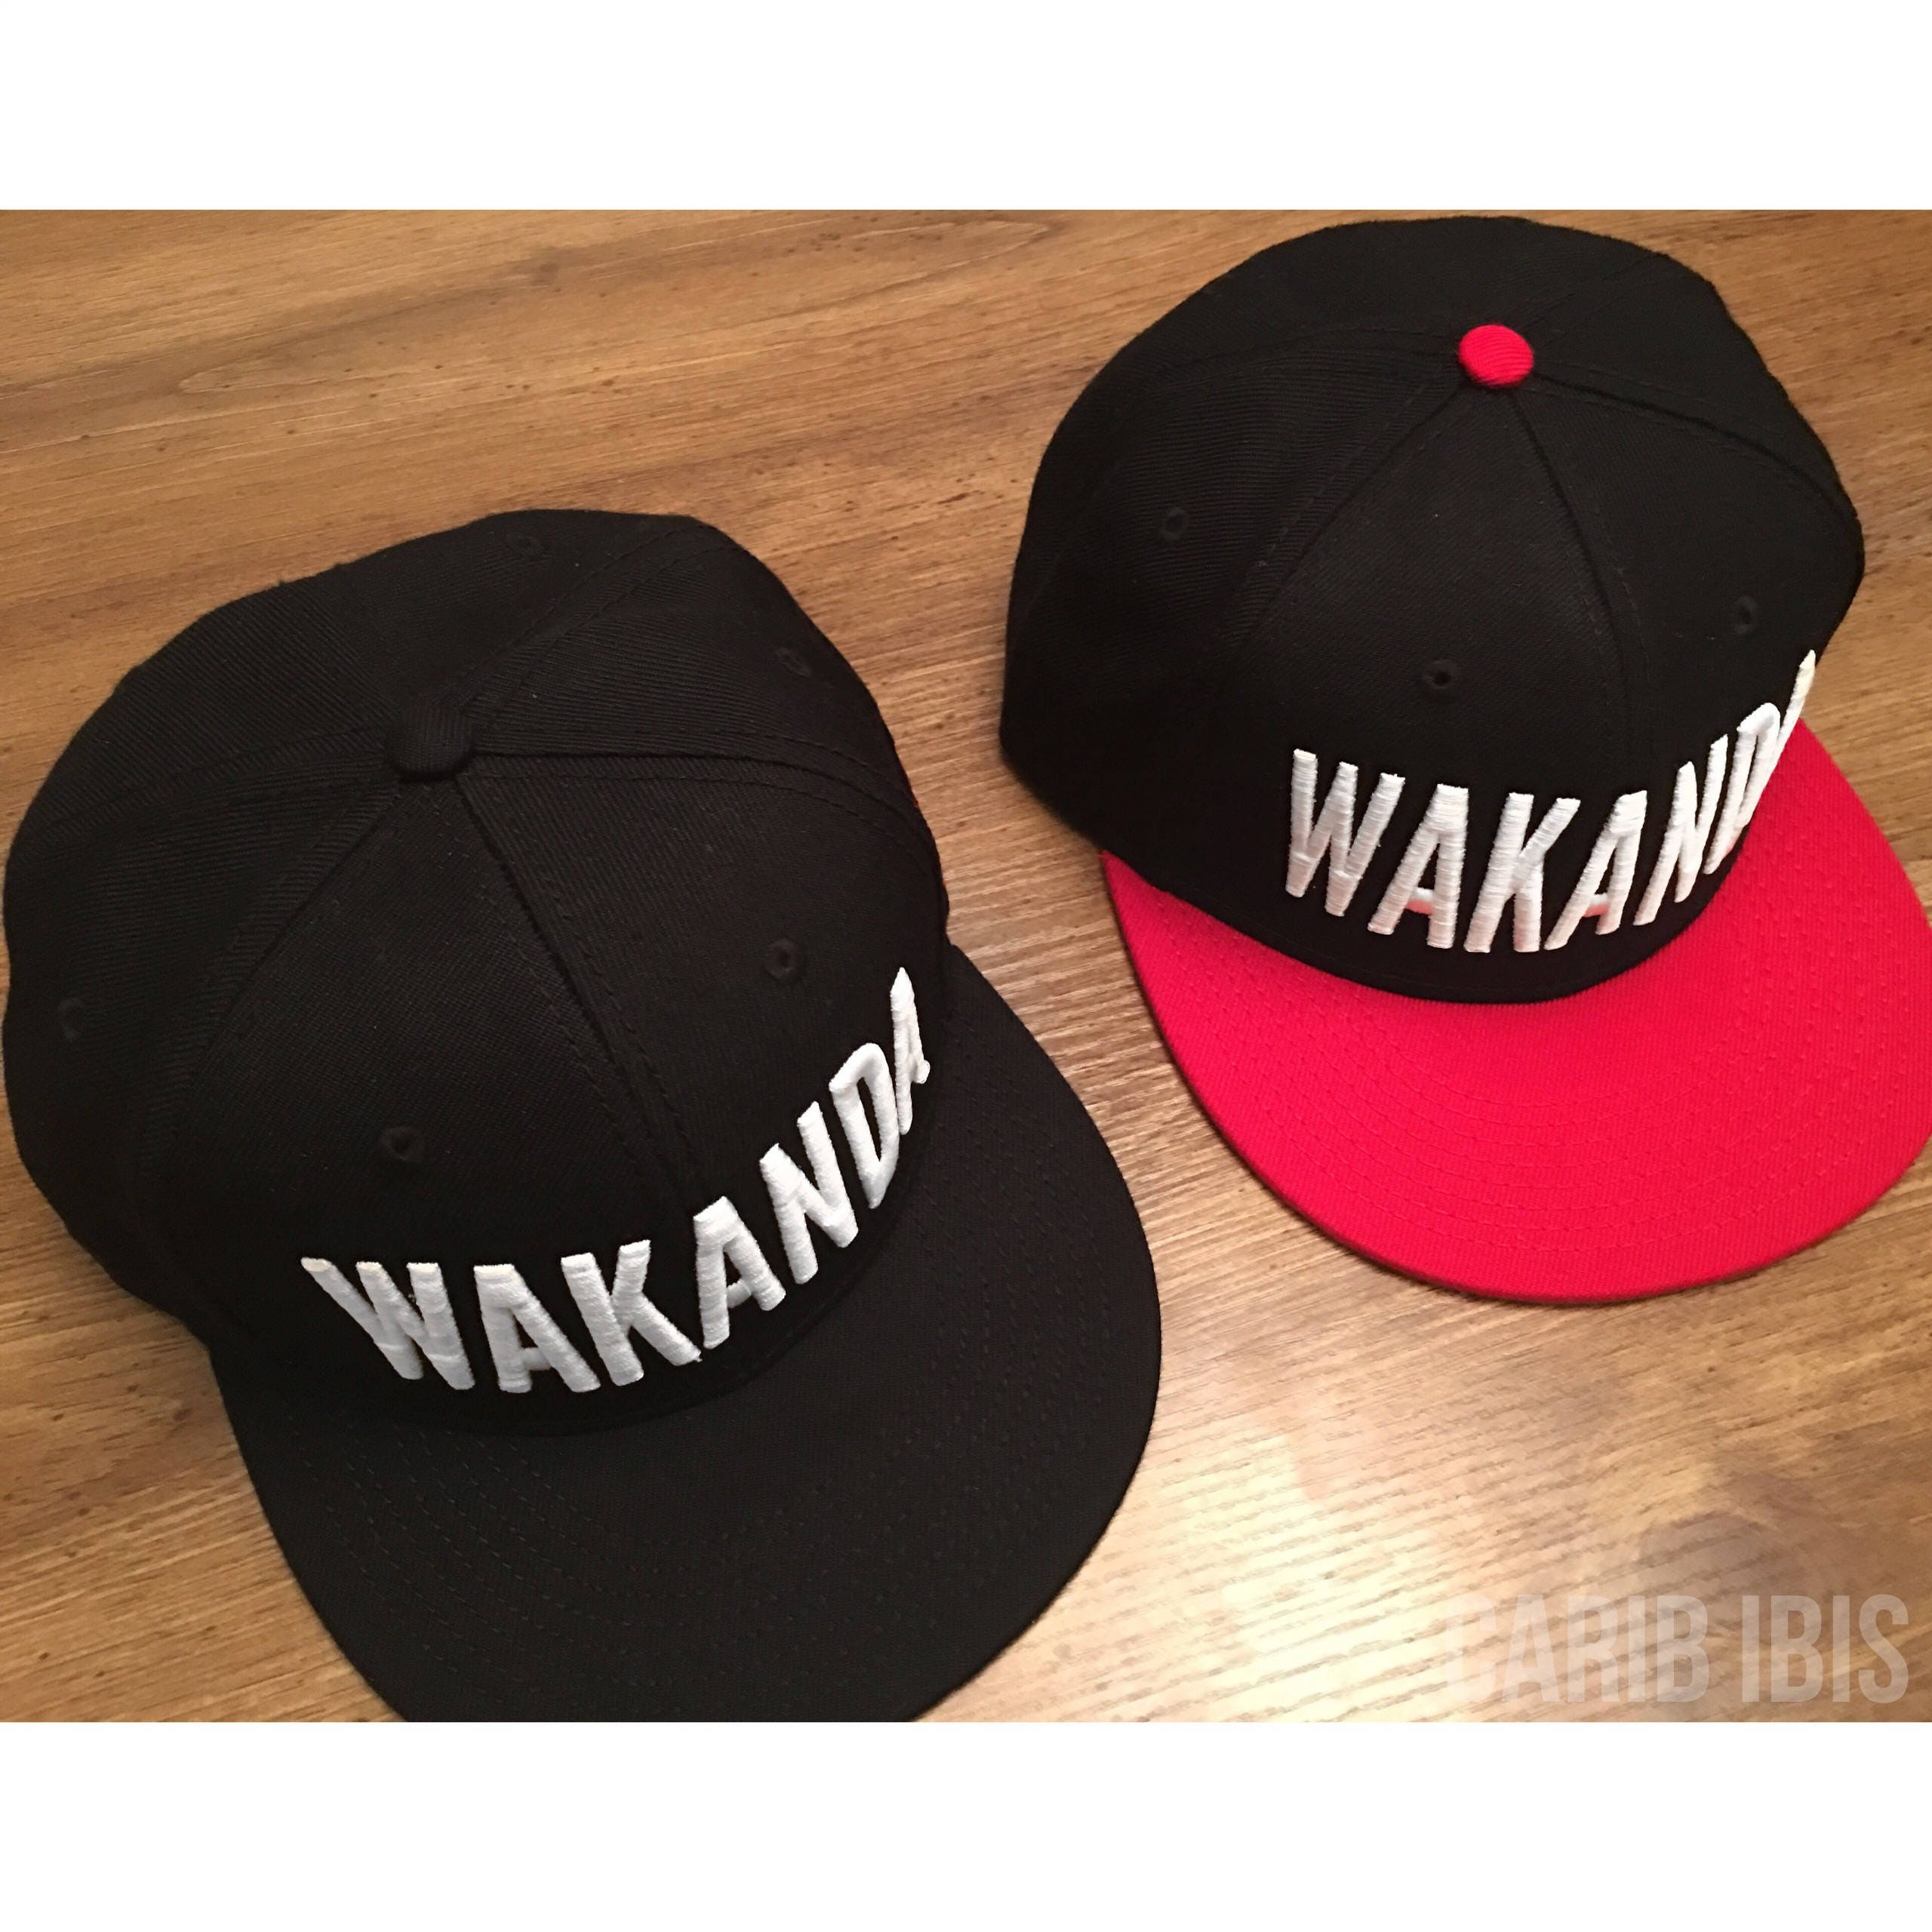 cfb8f8a52b0af Wakanda Hat Made in Wakanda Hat Snapback Black Panther Hat